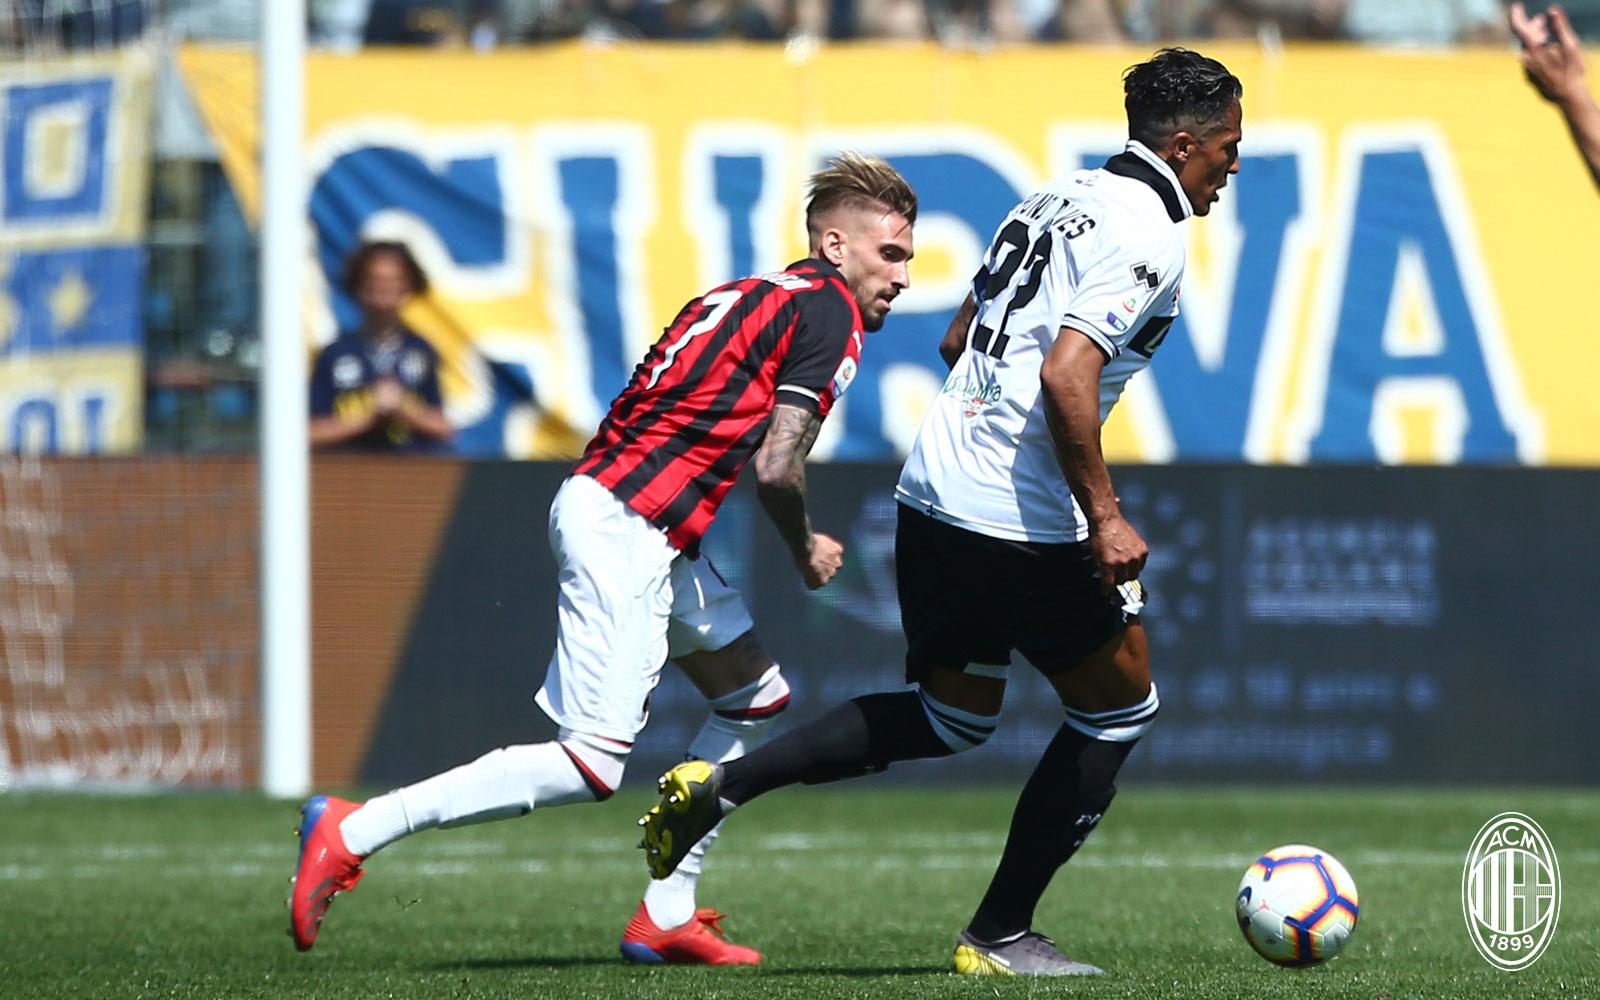 Samu Castillejo and Bruno Alves during Parma-Milan at Stadio Ennio Tardini on April 20, 2019. (@acmilan.com)